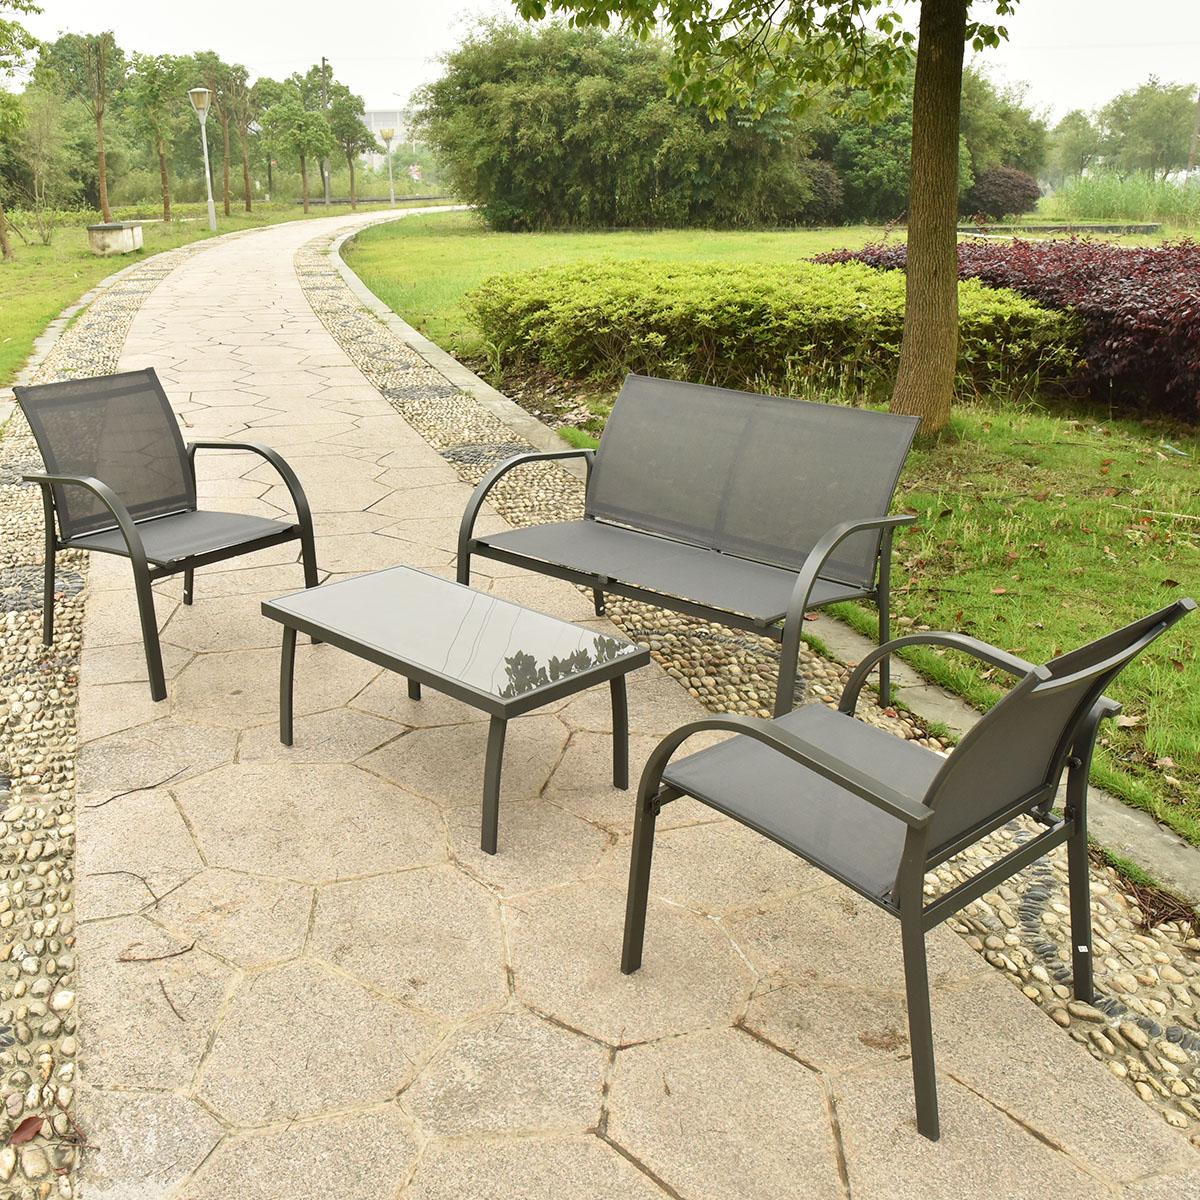 garden patio sets costway 4pcs patio garden furniture set steel frame outdoor lawn sofa FAWOFIY